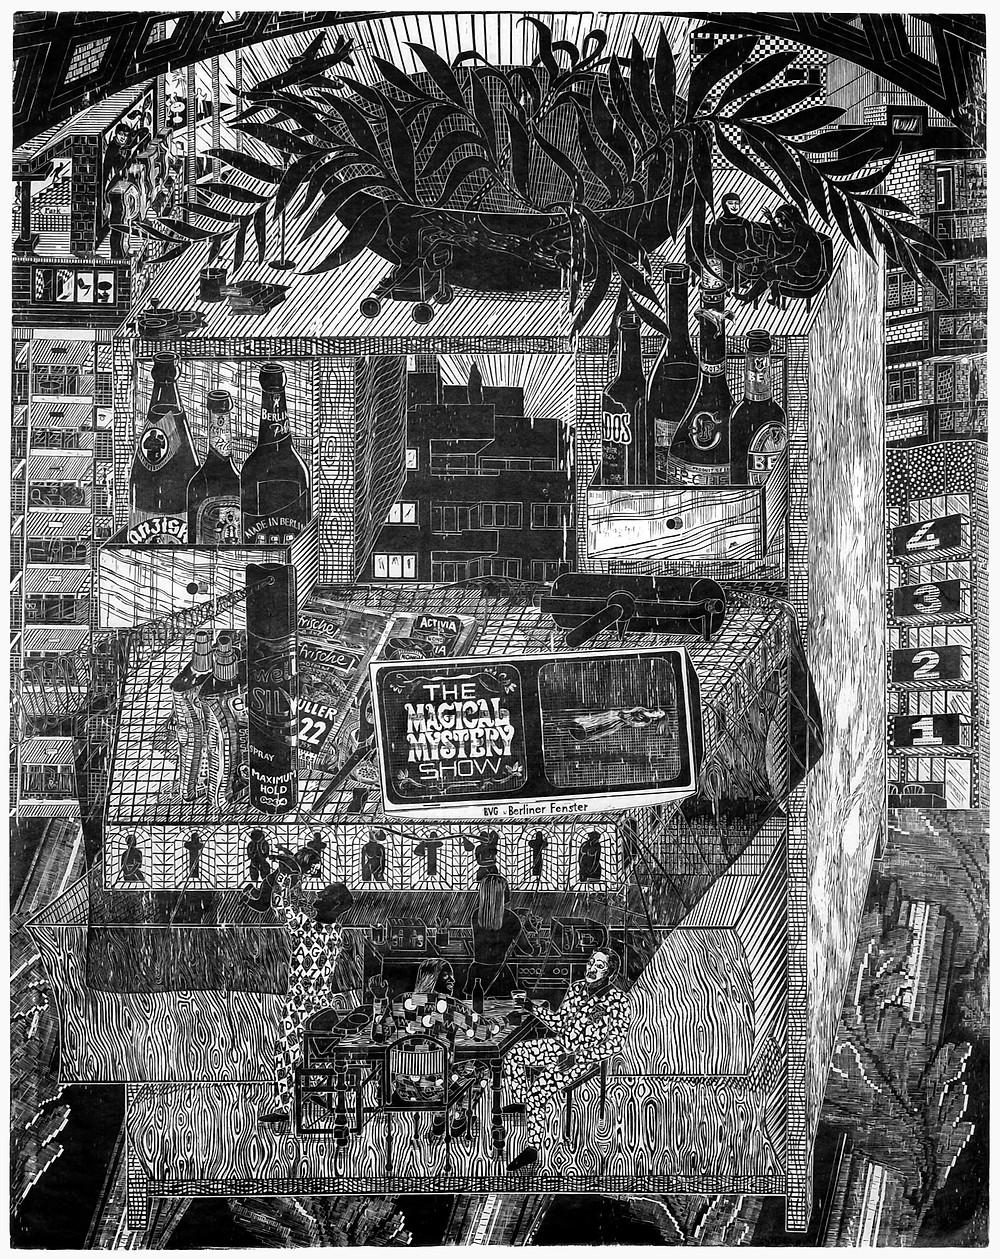 Gabriela Jolowicz - Present Density